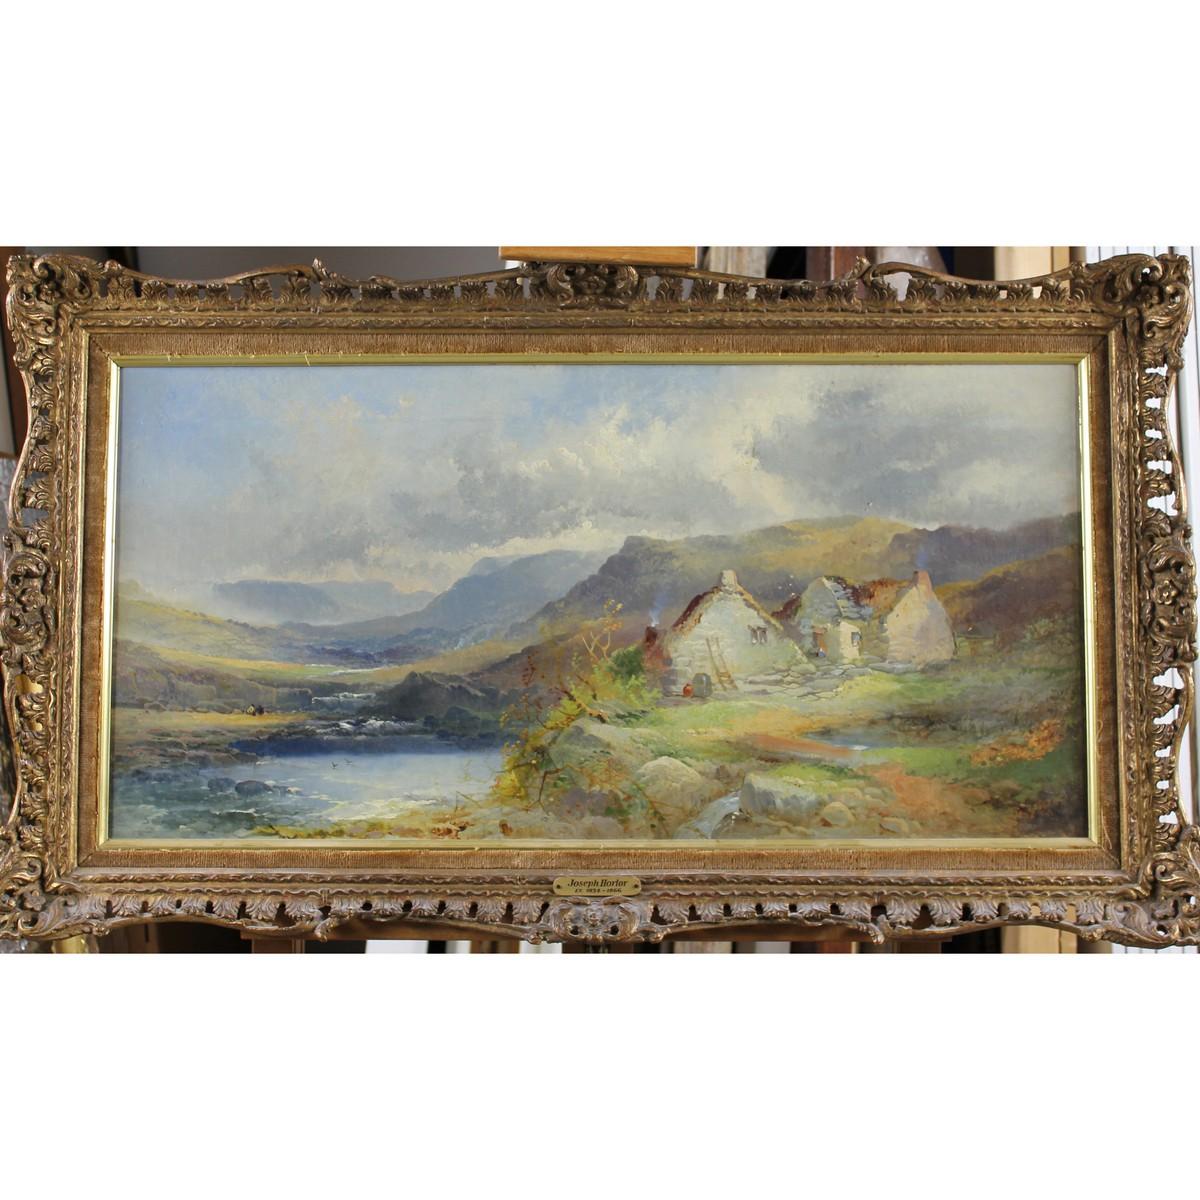 Lot 43 - Horlor, Joseph 1809-1897 British, Scottish Hills with Cottage